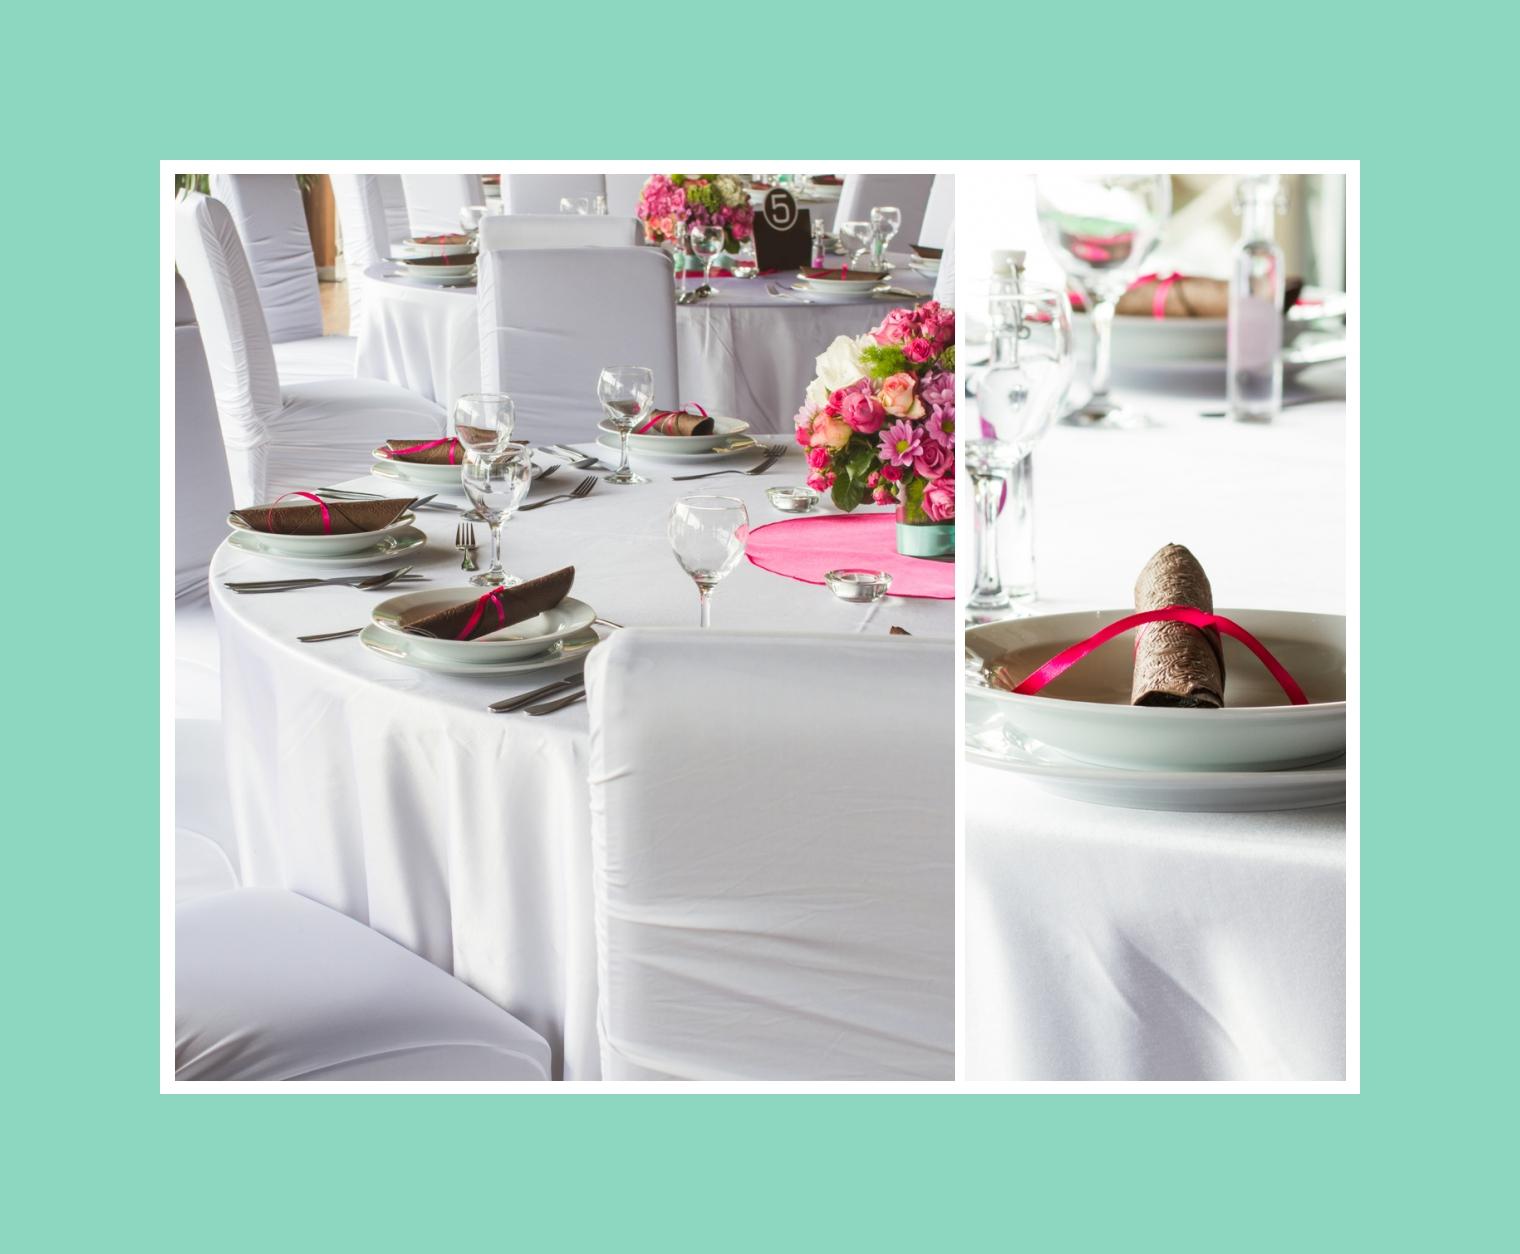 Elegante Tischdeko in Braun, Rosa, Minze